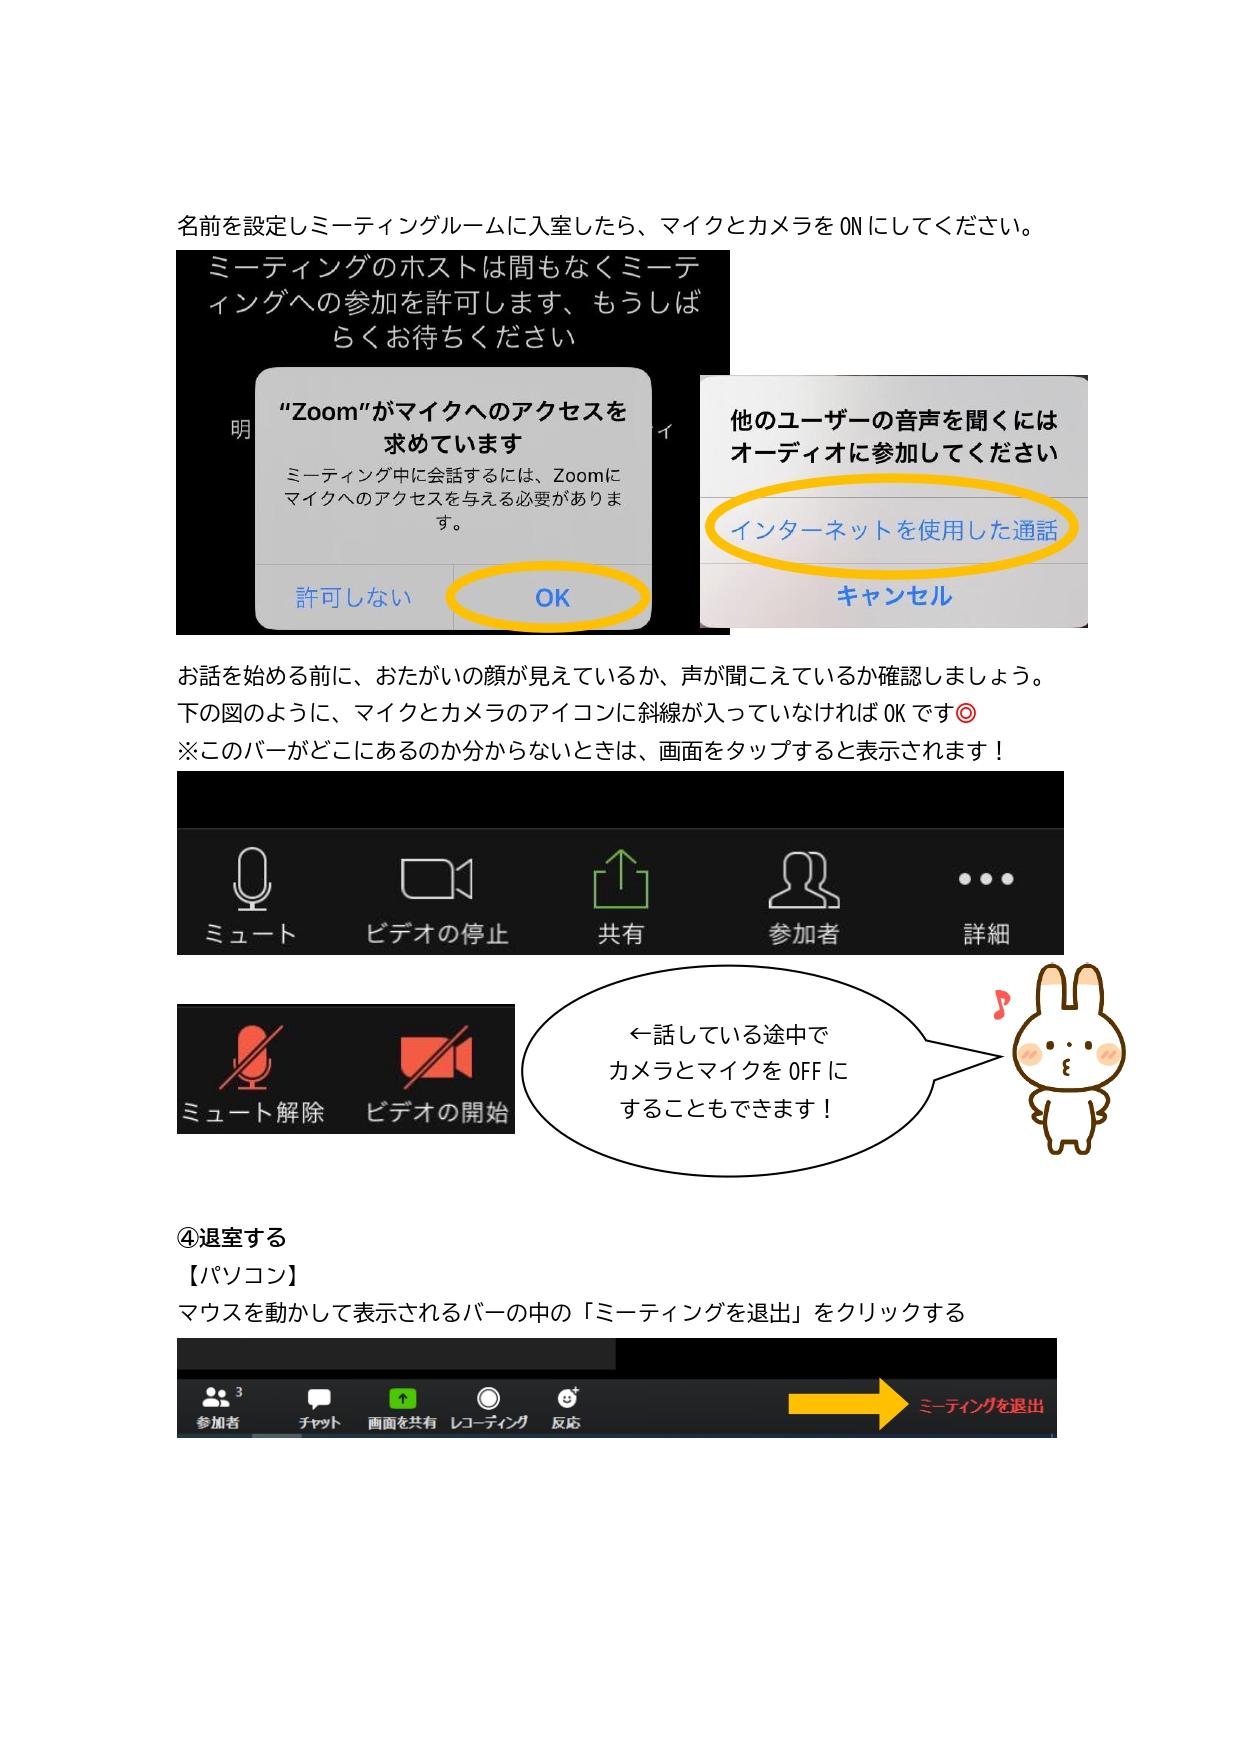 Zoomの使い方 (5)